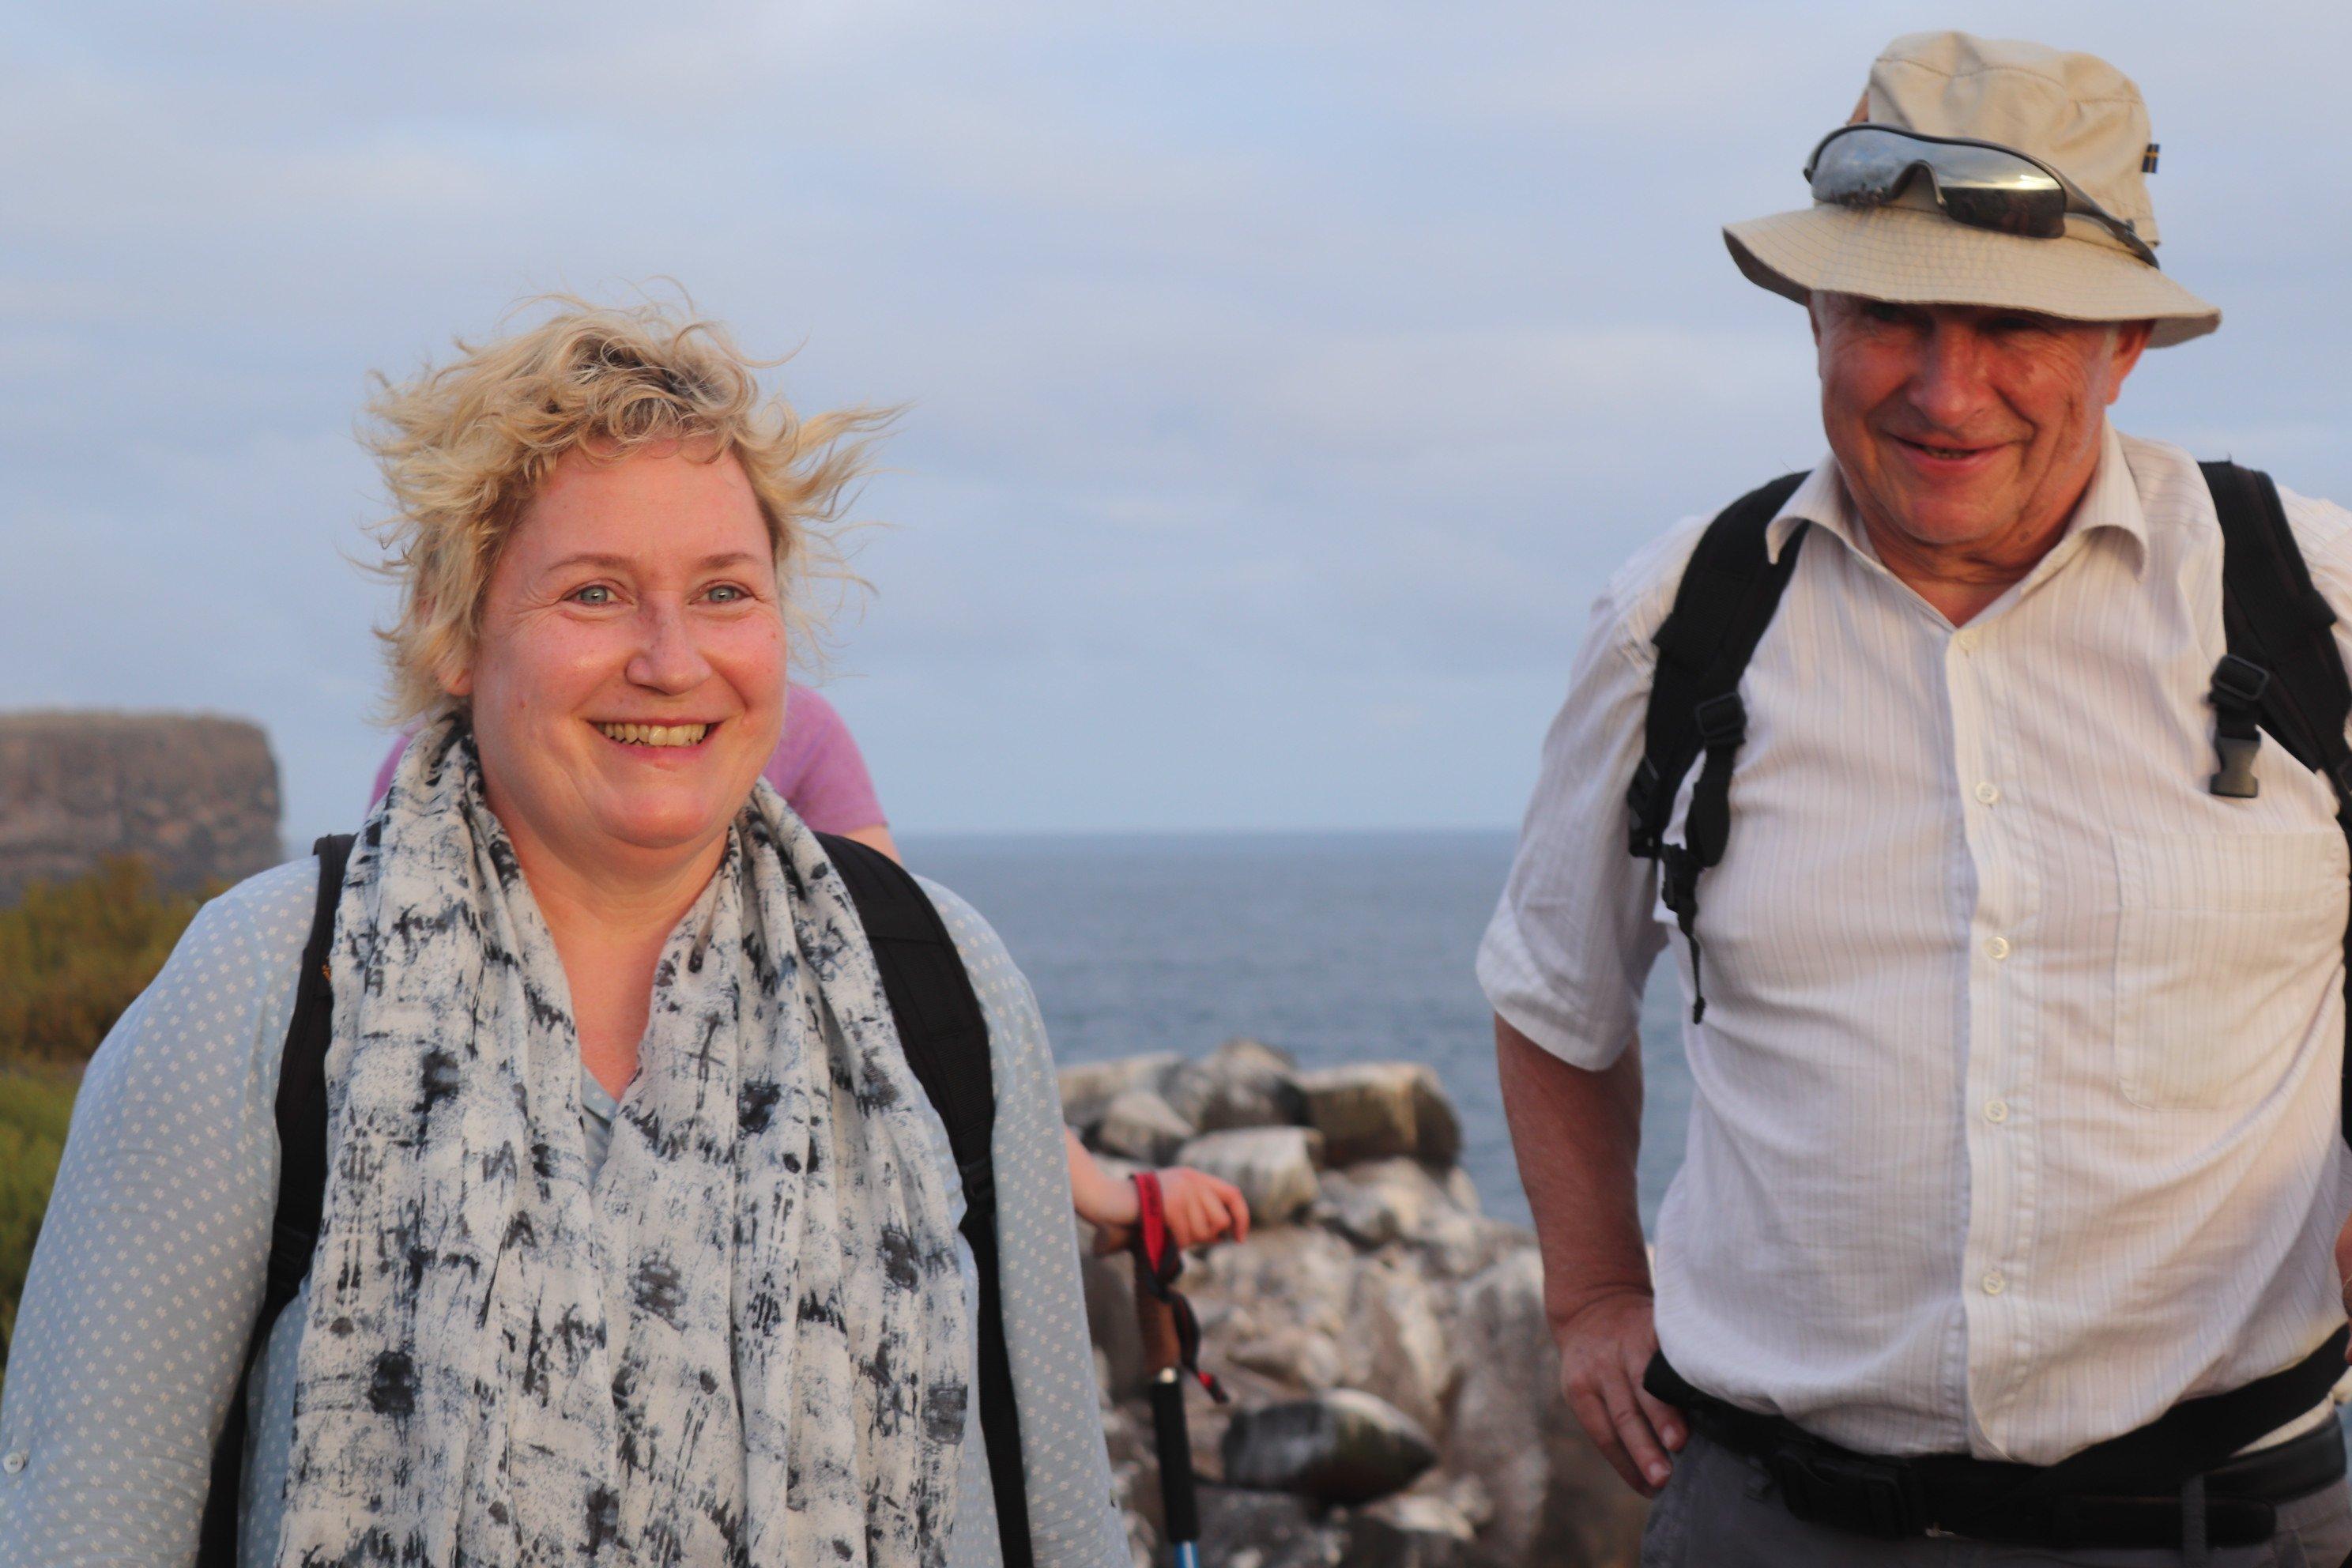 Beate - Gründerin Galapagos PRO - auf Española mit Reiseteilnehmer